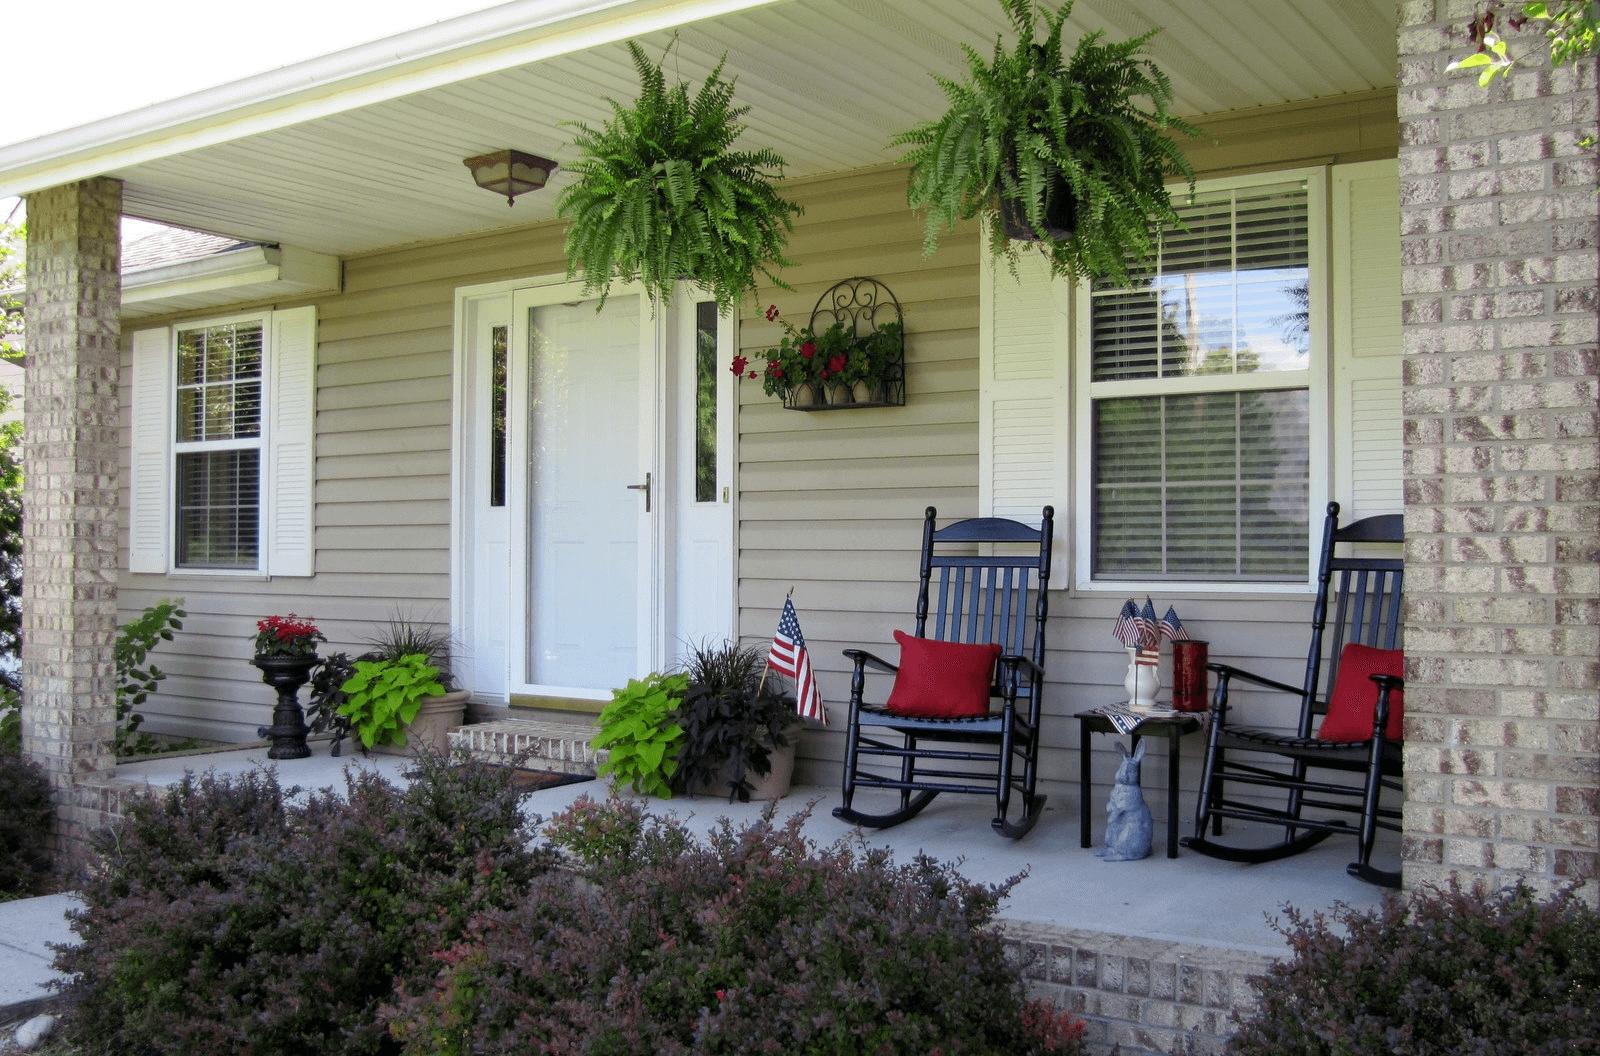 10 Elegant Small Front Porch Decorating Ideas front porch decorating ideas 2021